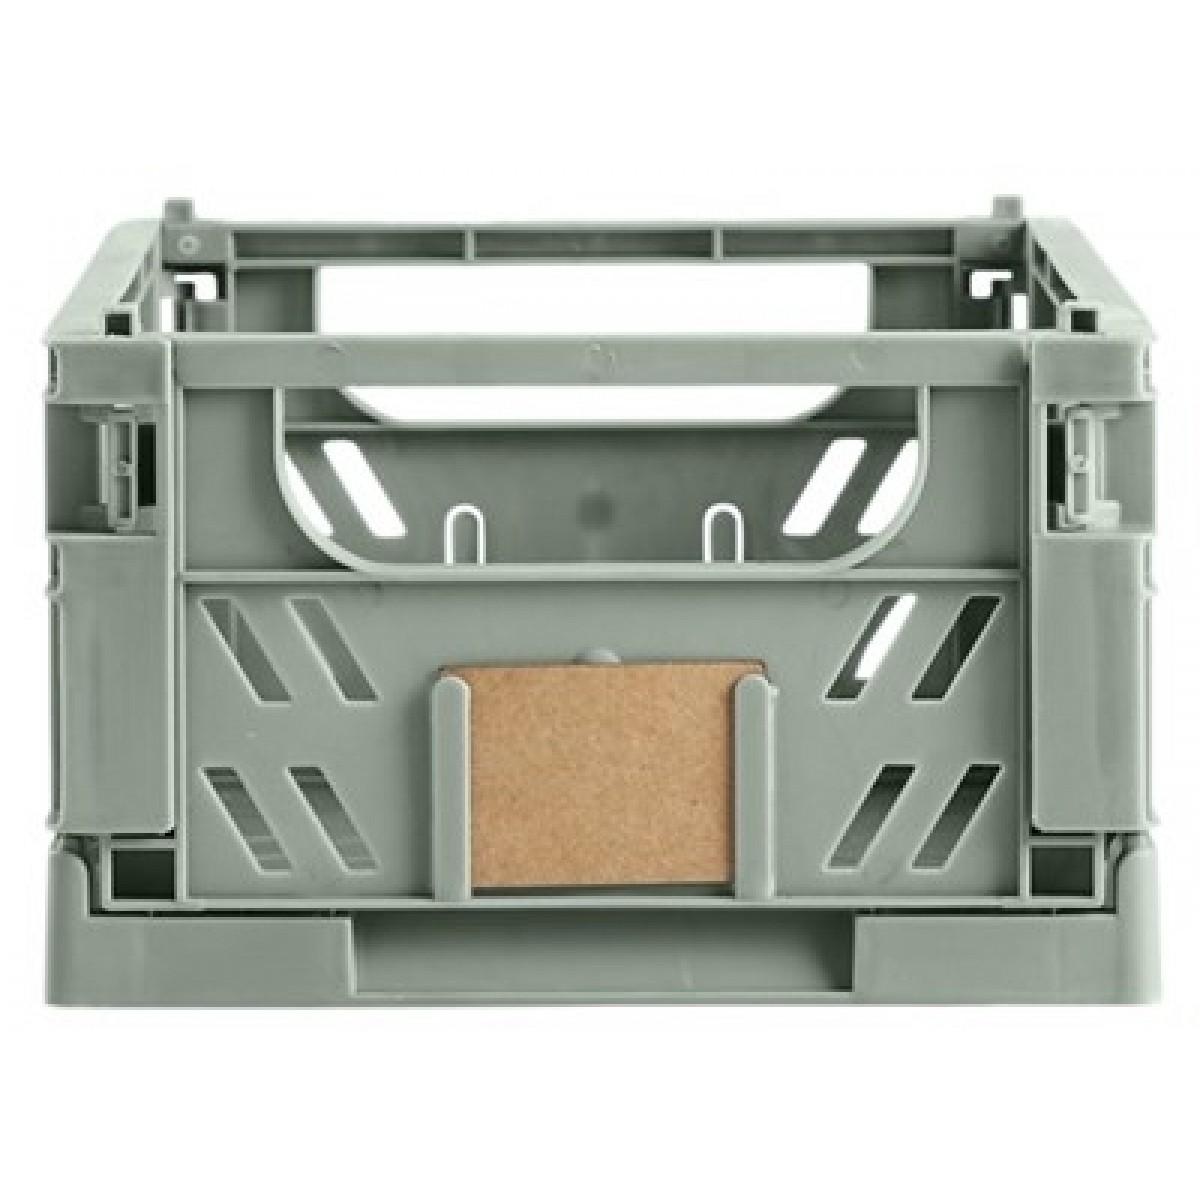 DAY Opbevaringskasse foldbar 25x16,5x10 cm mint green